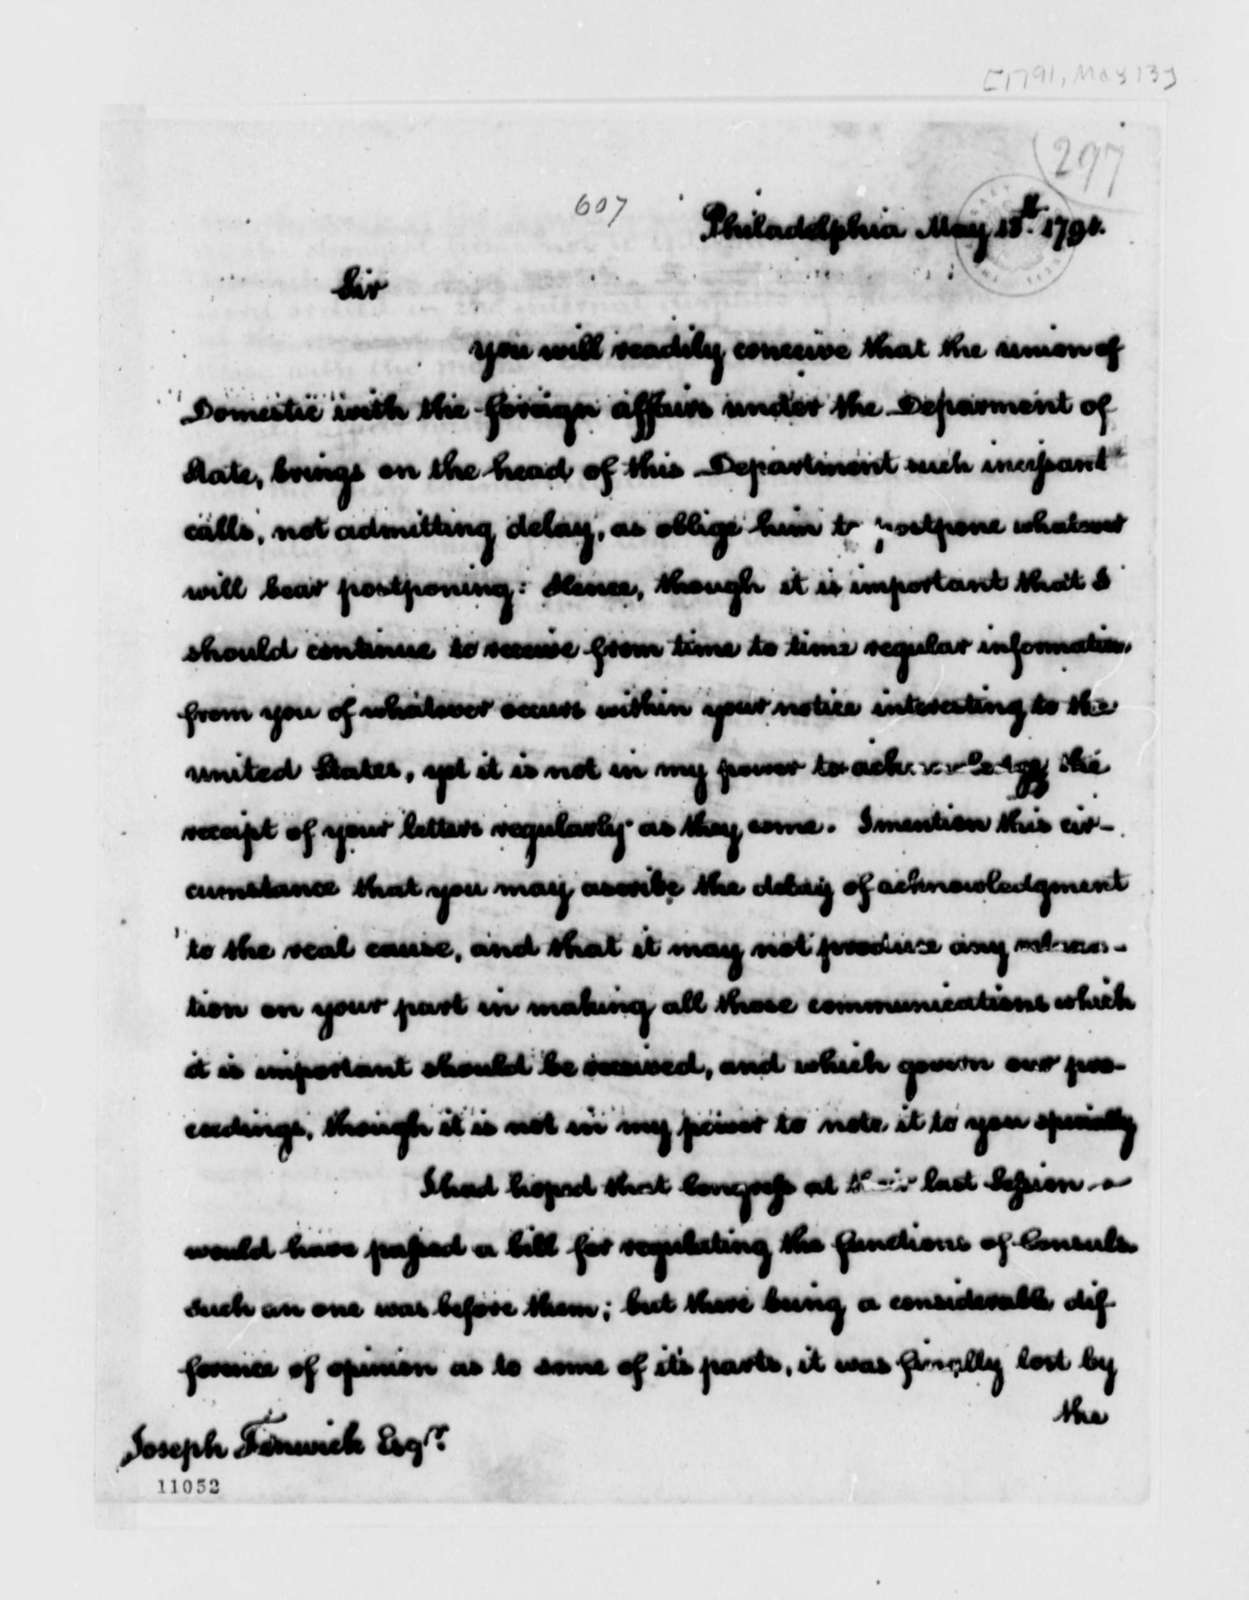 Thomas Jefferson to Joseph Fenwick, May 13, 1791